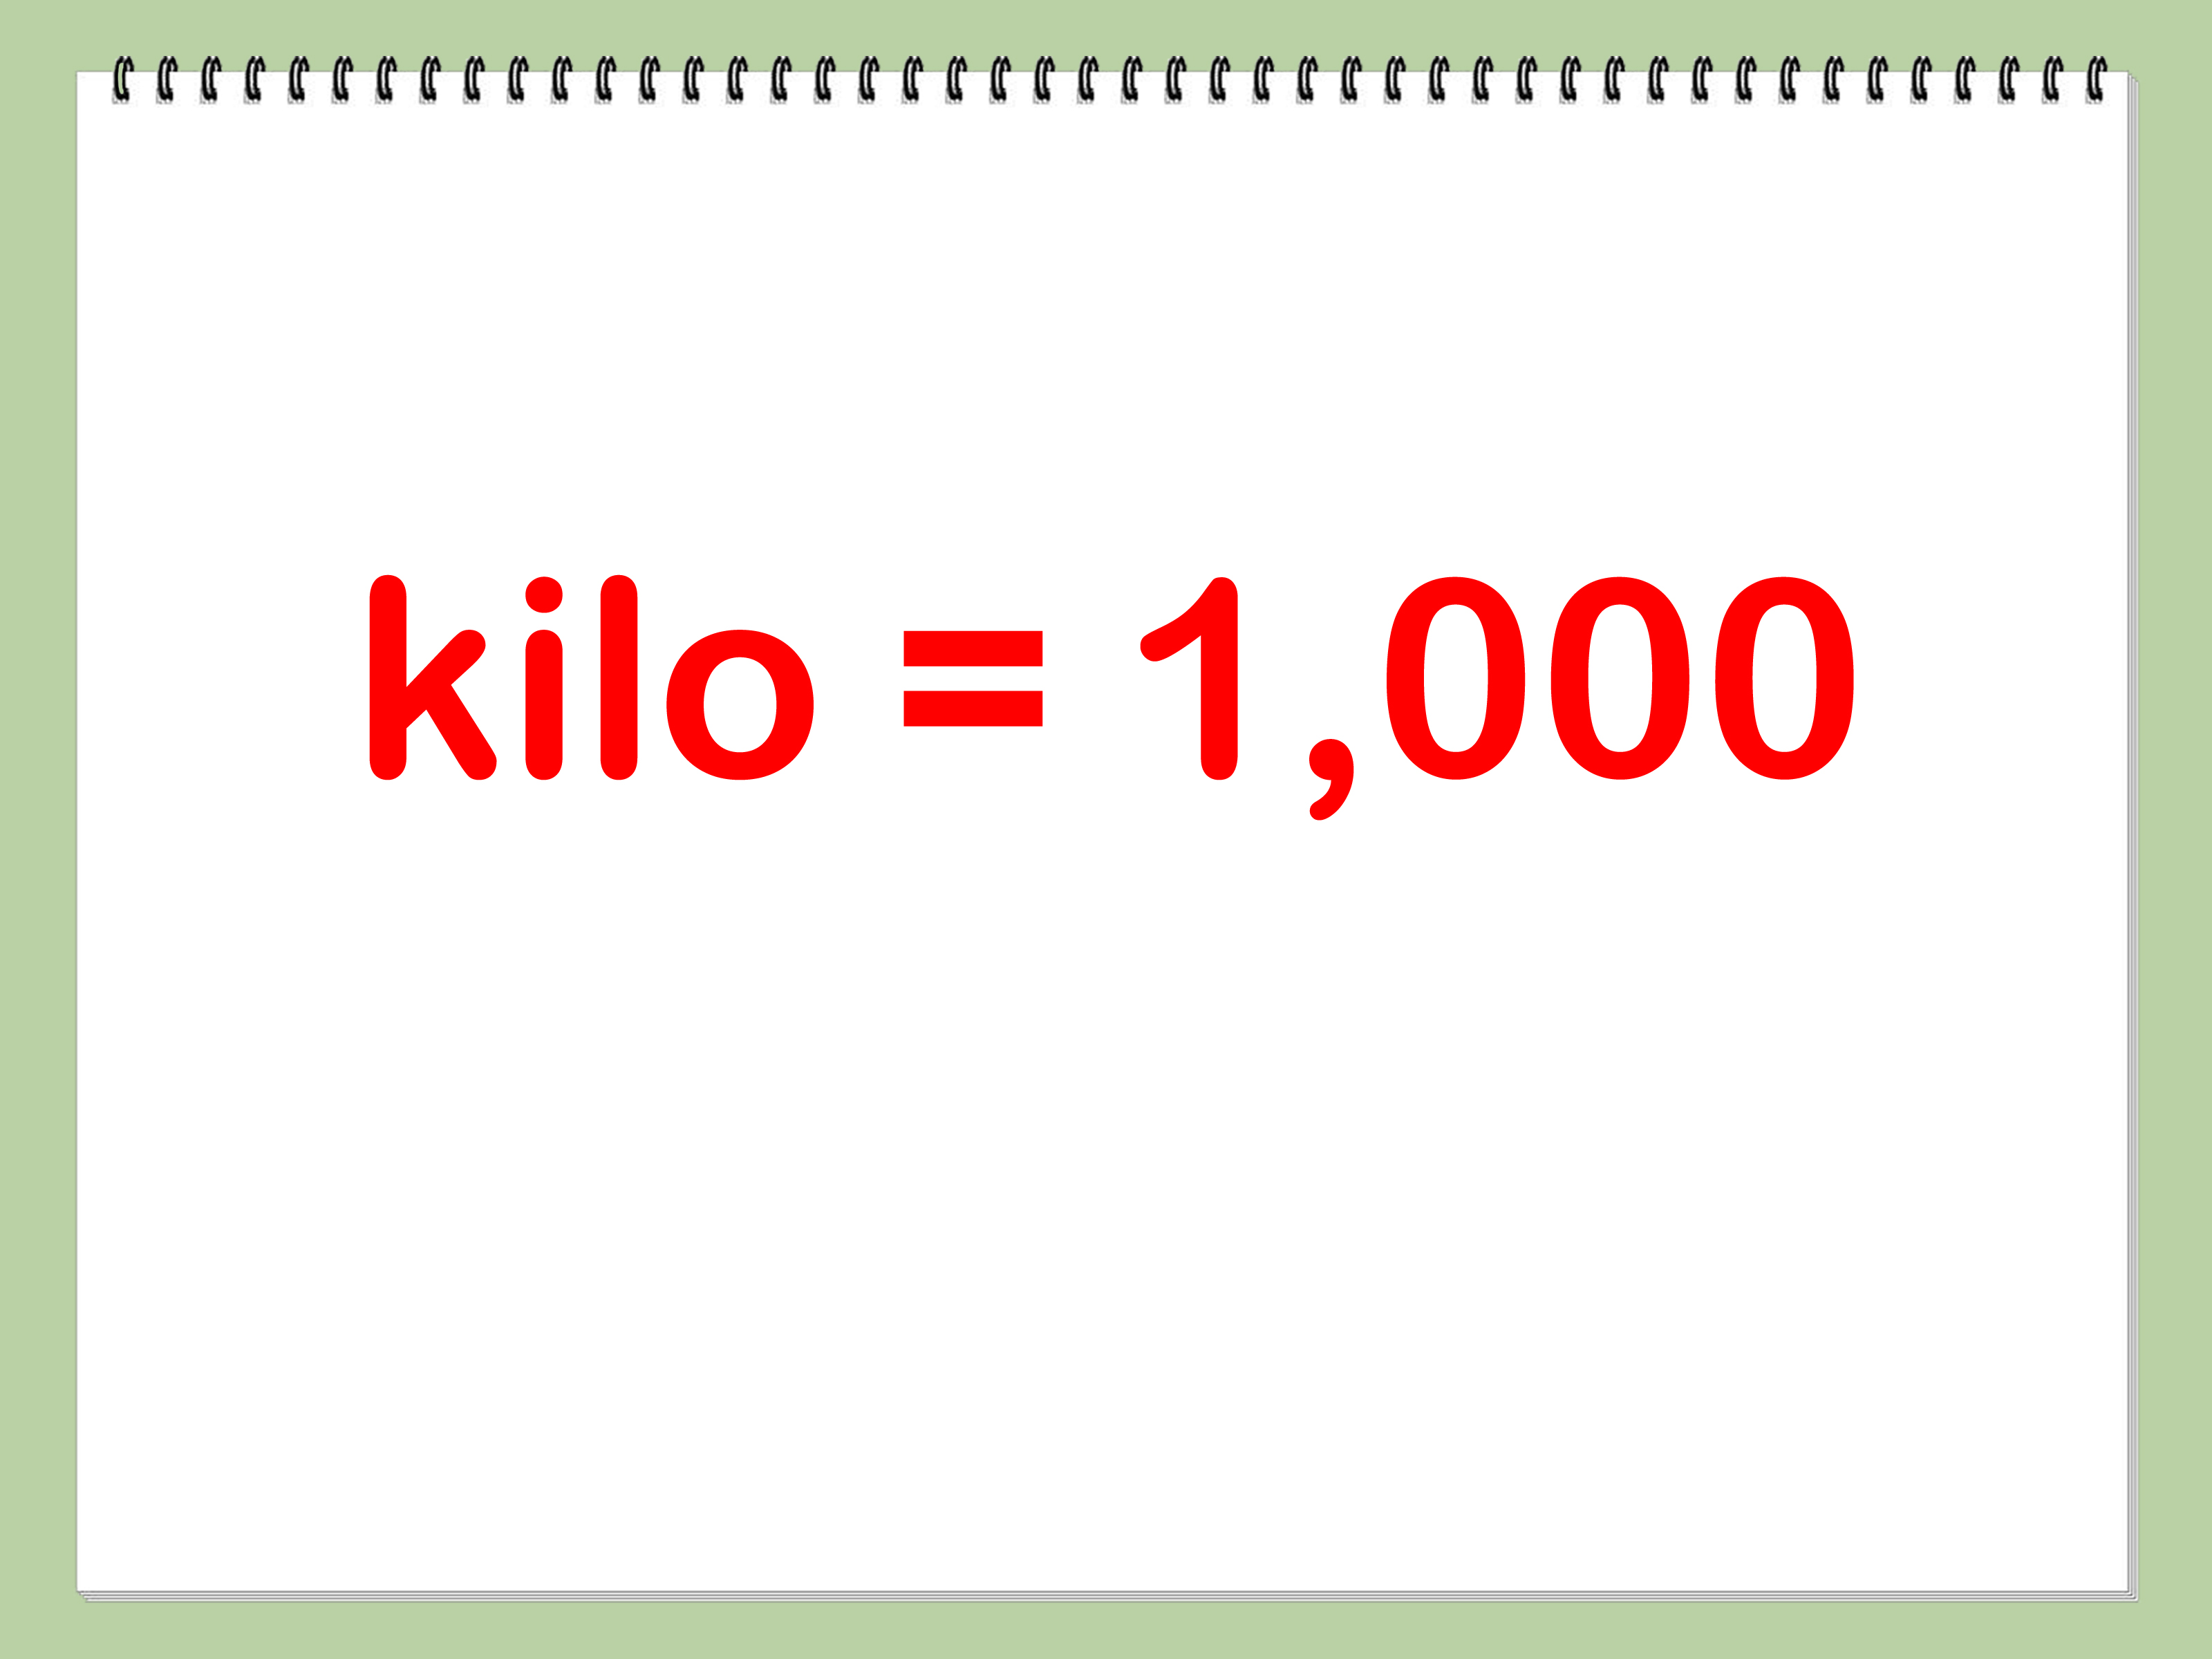 Convert Cups To Kilograms